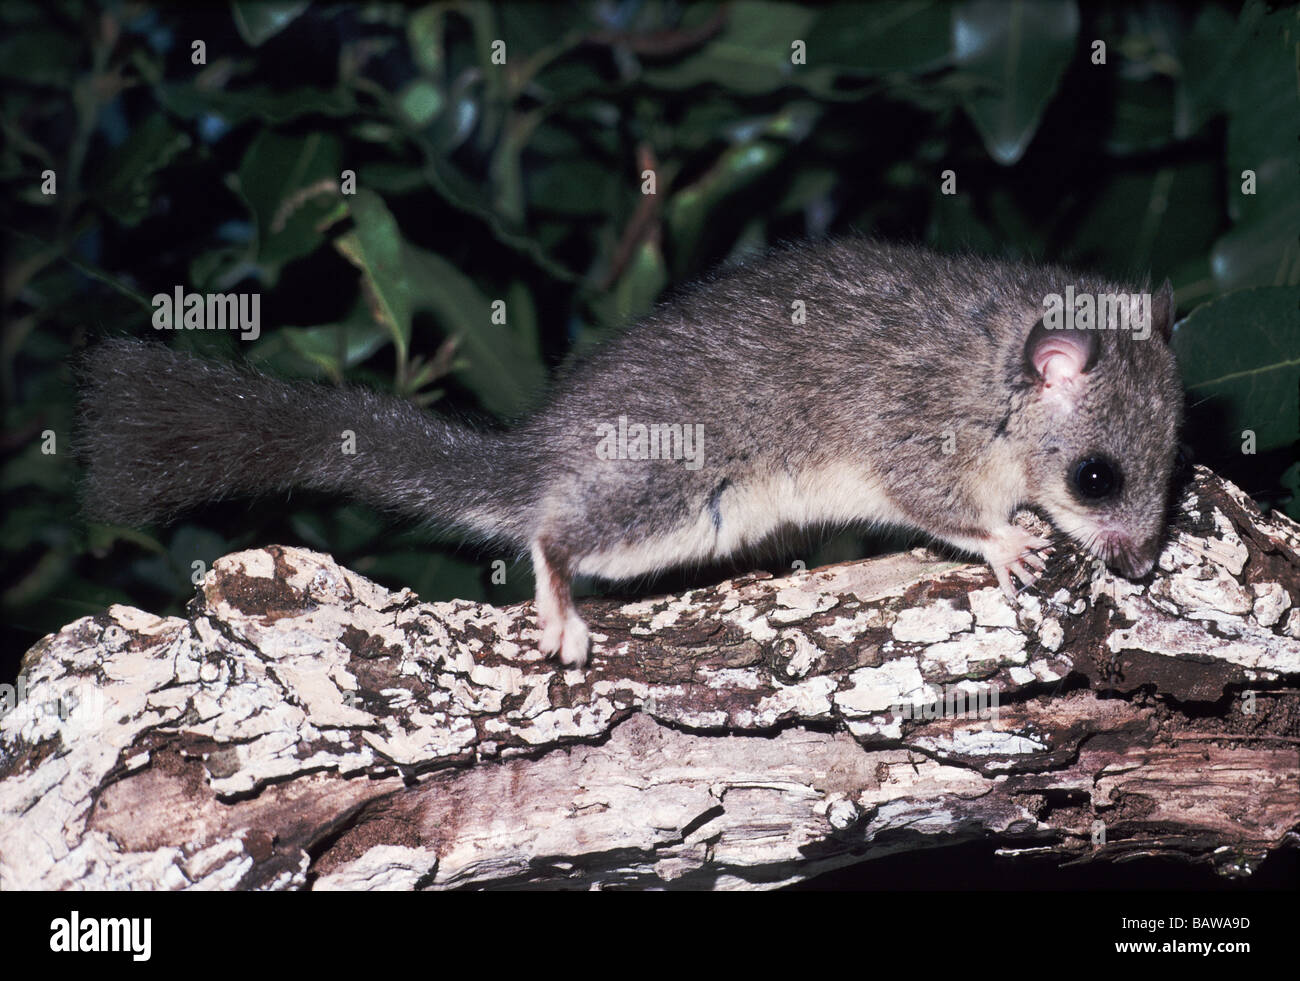 Mammals;Fat or Edible Dormouse;'Glis glis';Male on a fungus covered branch. - Stock Image